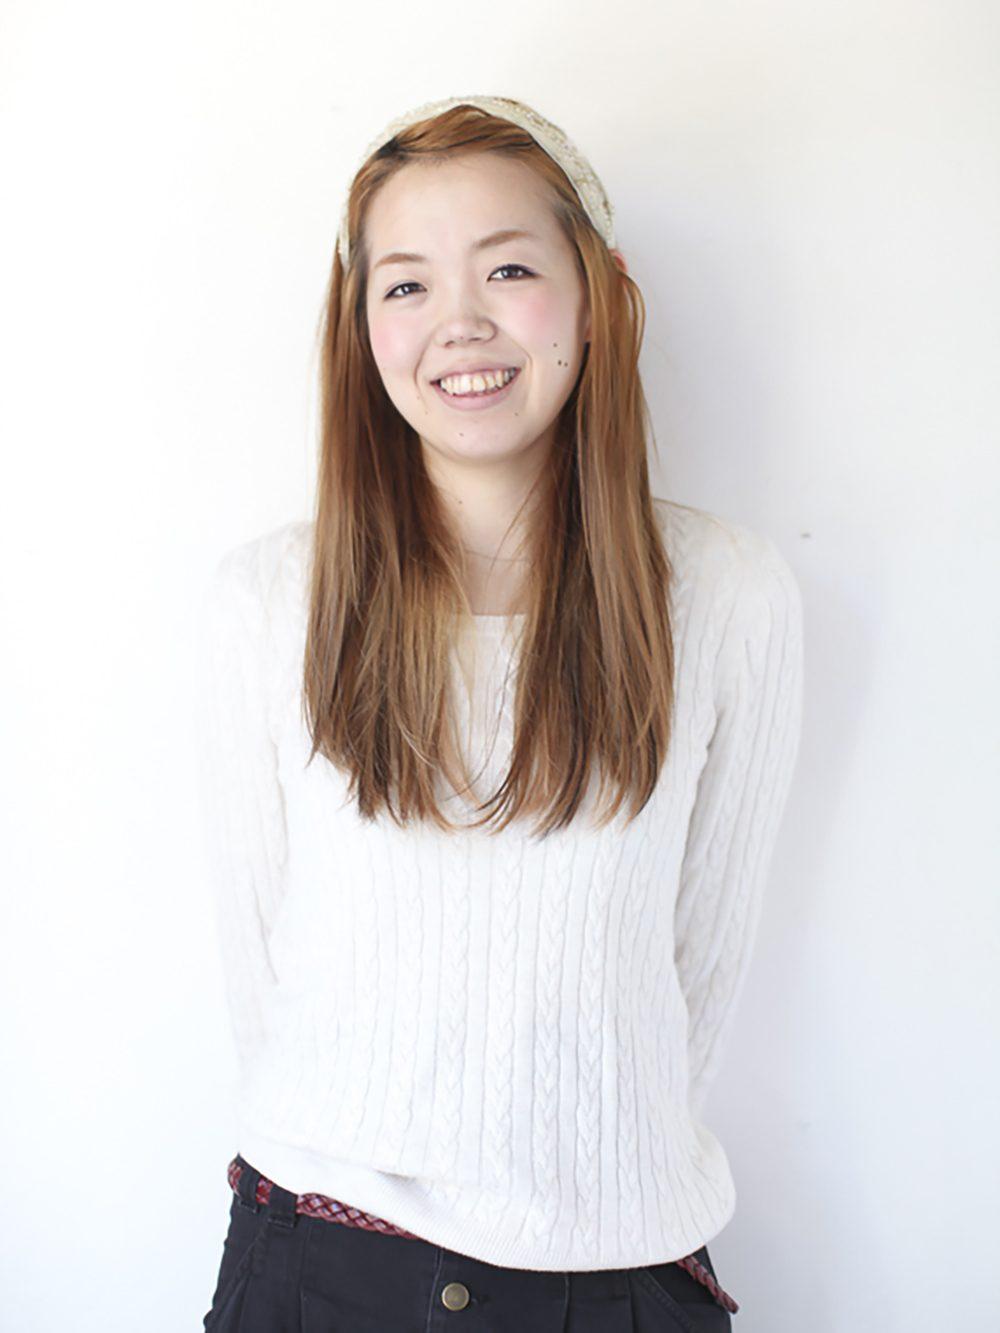 CHIAKI YOKOE/Stylist